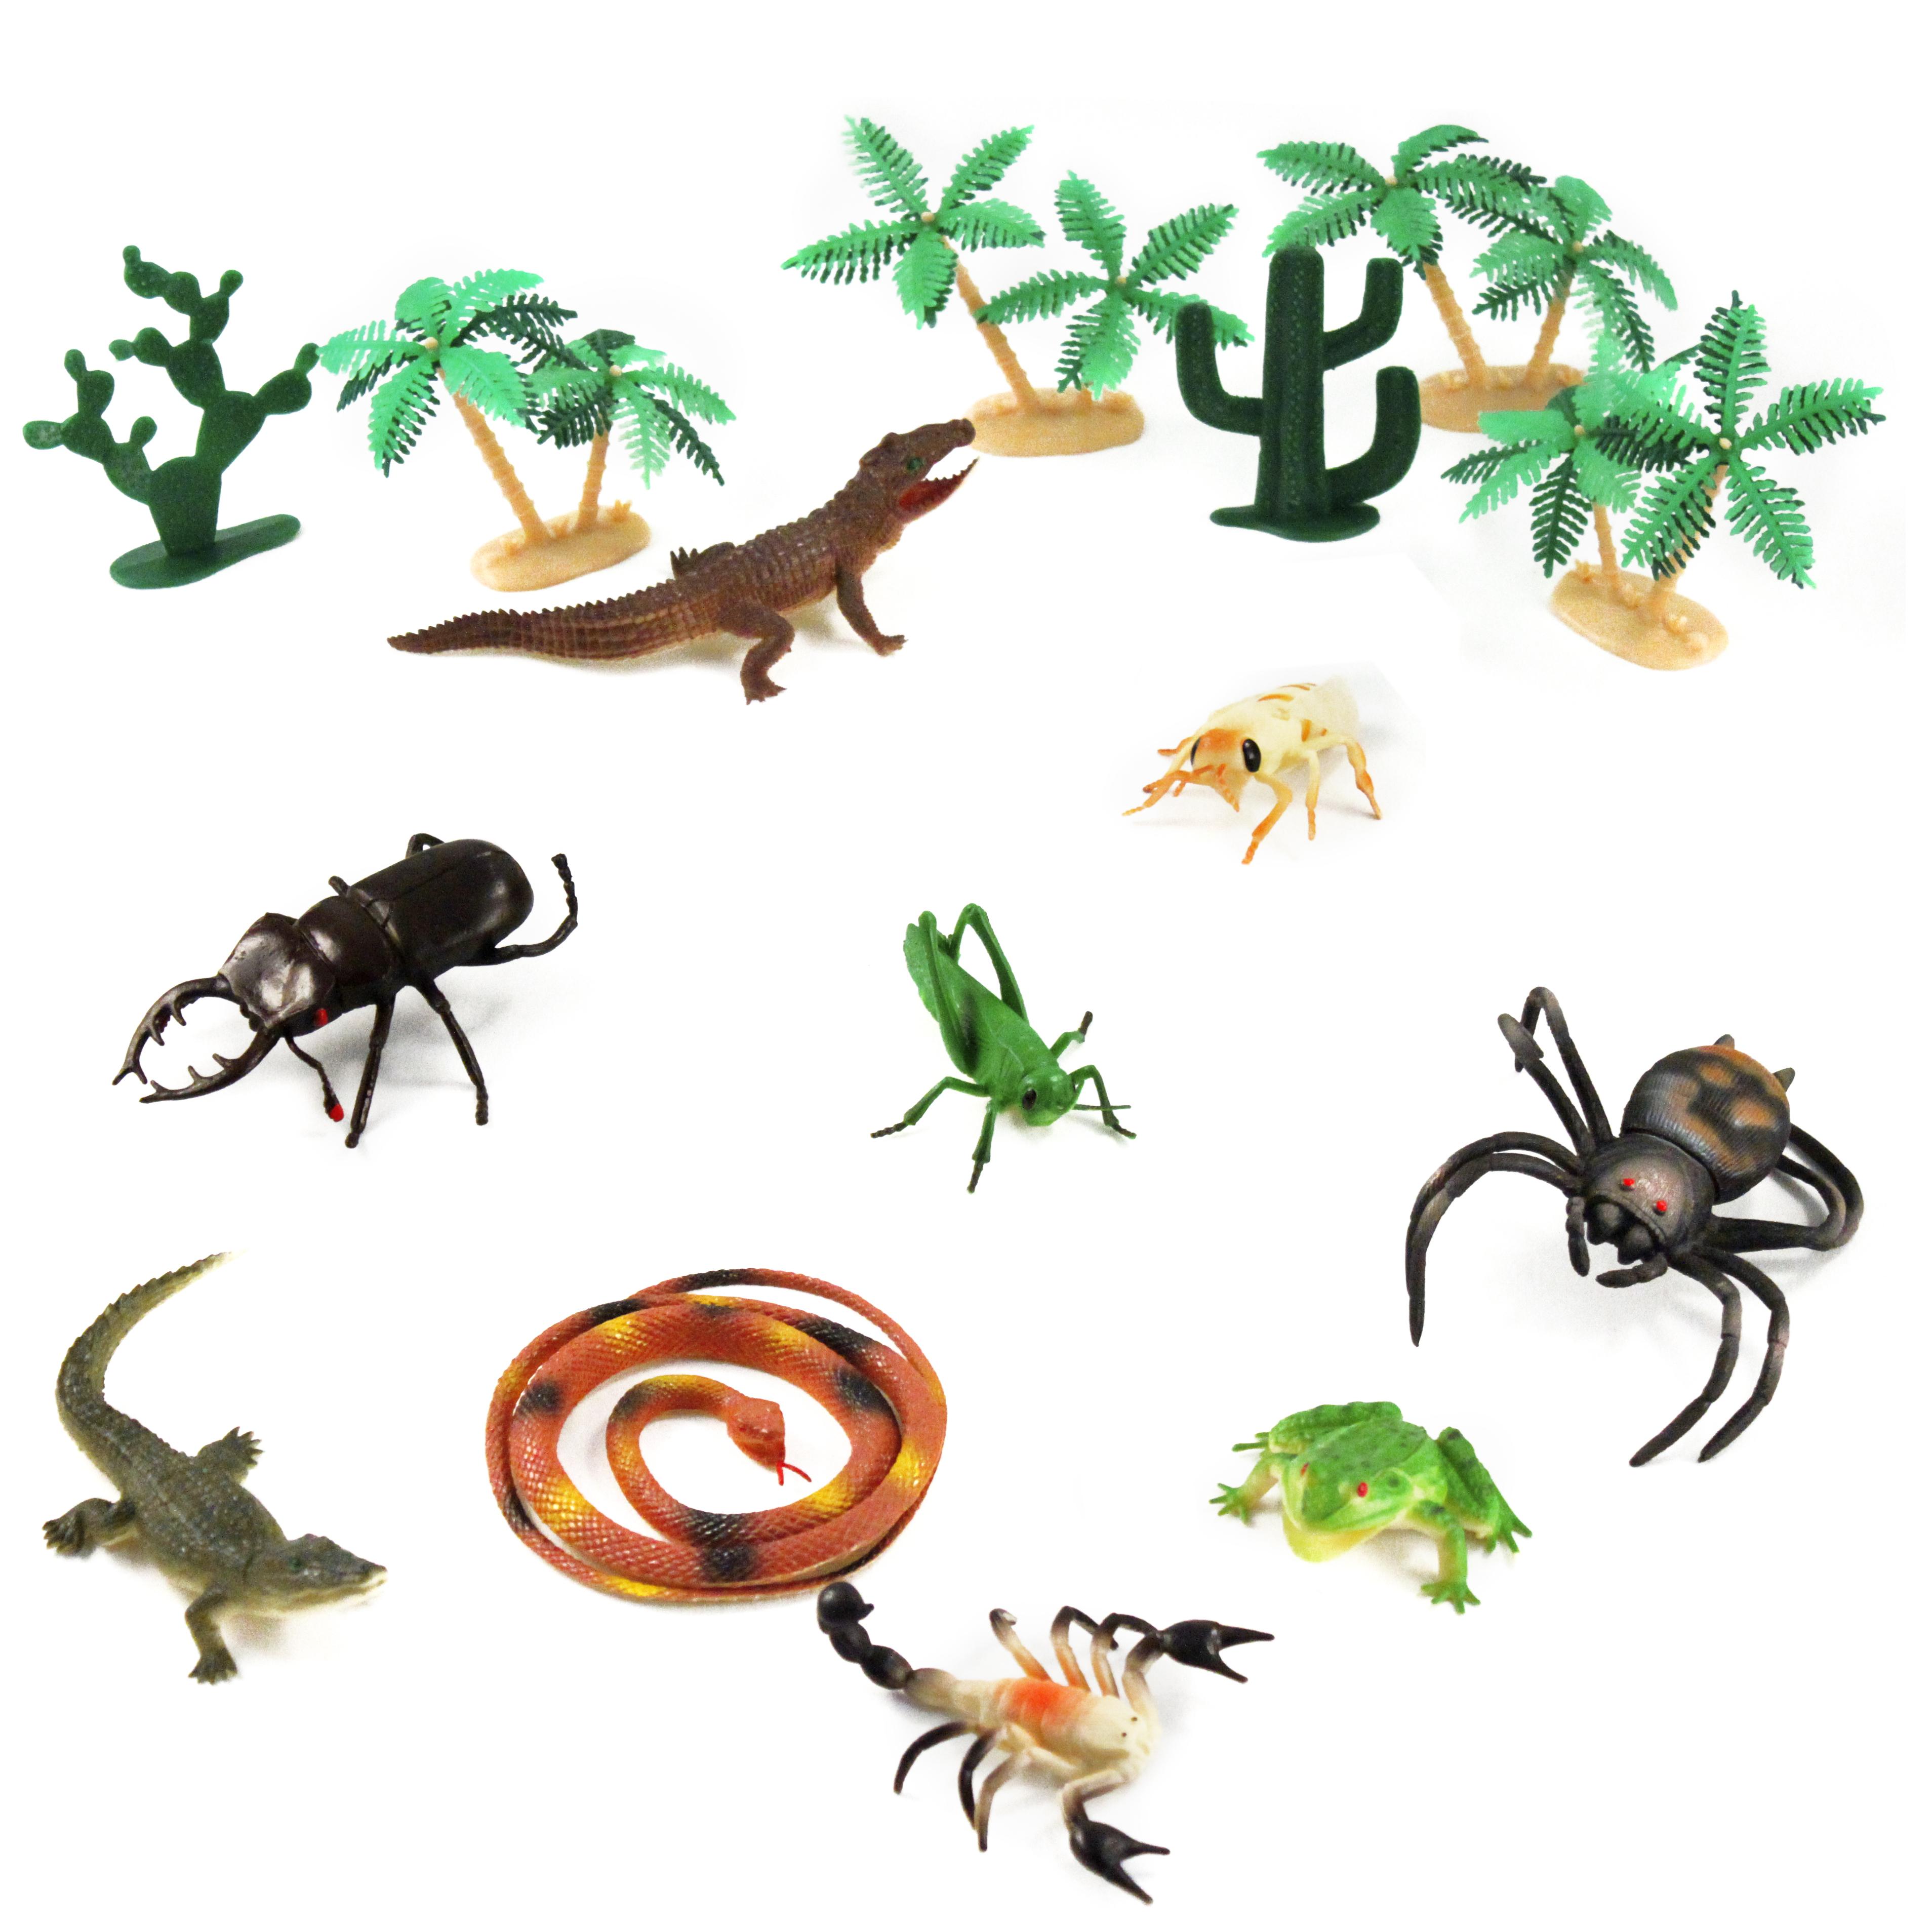 16 Piece Wetland Swamp Animals And Plants Toy Bucket Set